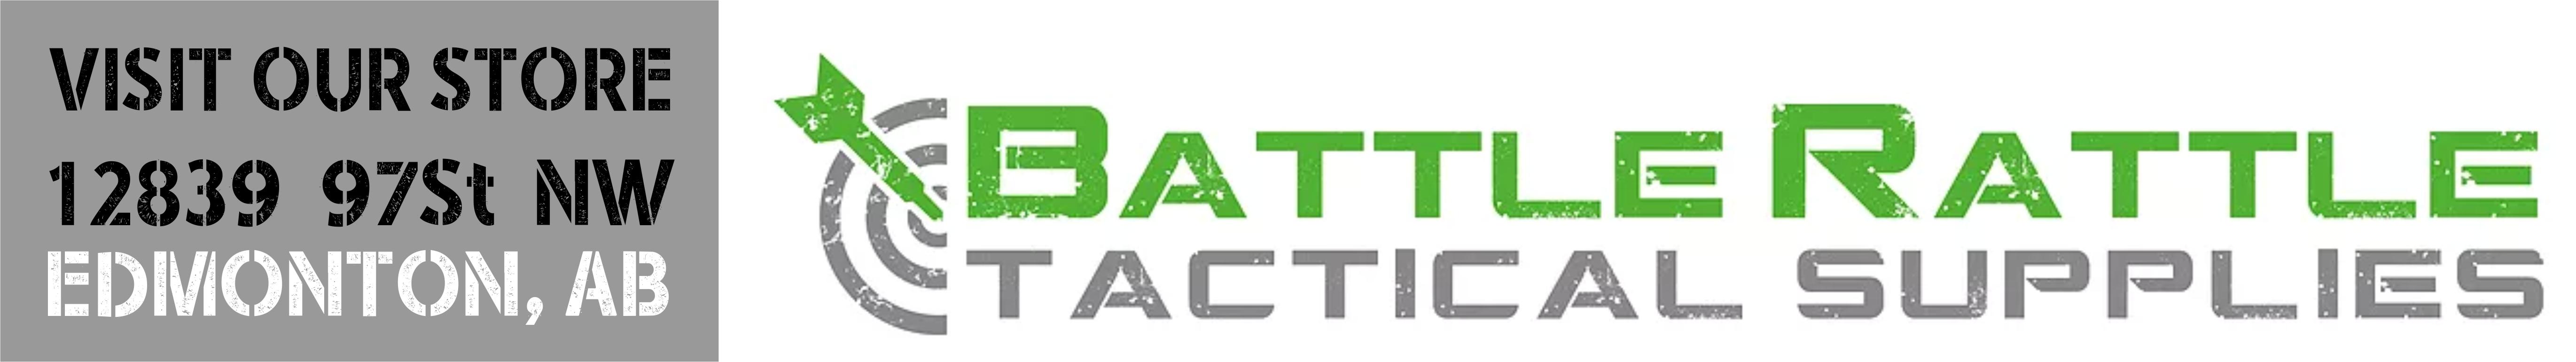 battlerattle-website-banner-edmonton.jpg